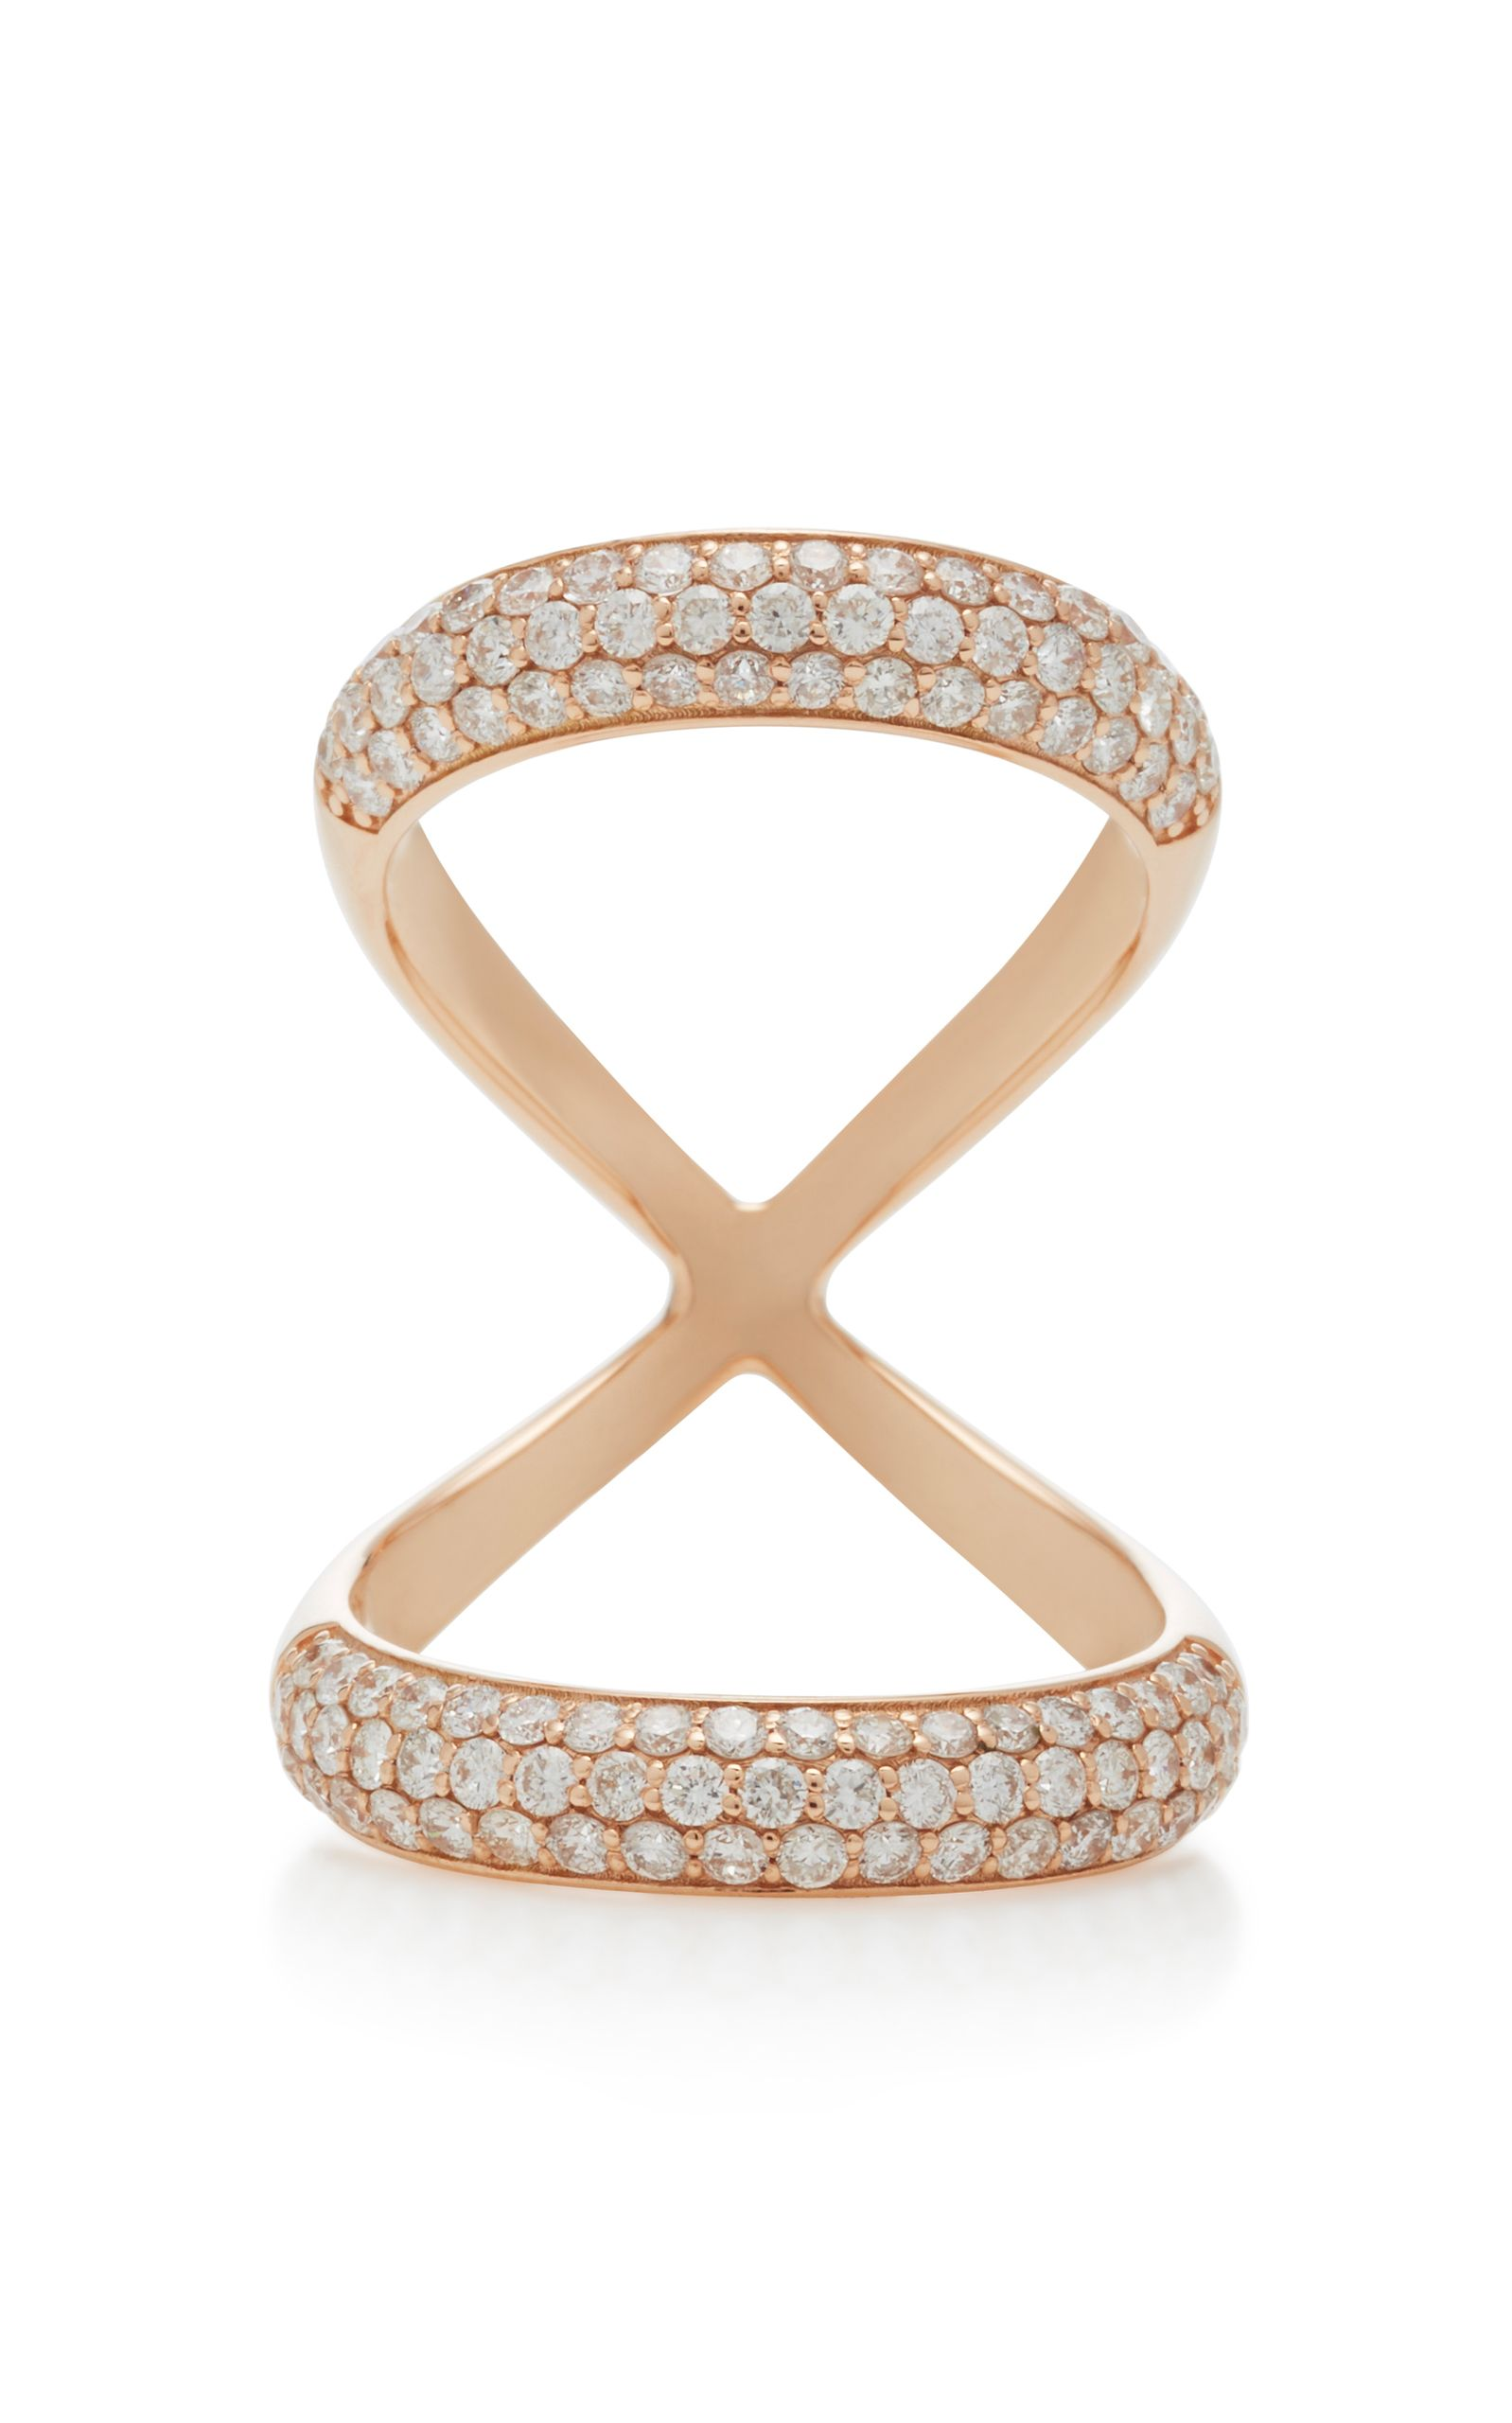 Carbone Et Hyde Femme 14 Carats Rose Collier De Diamants Or Rose Taille Or Carbone Et Hyde 6nKAzo